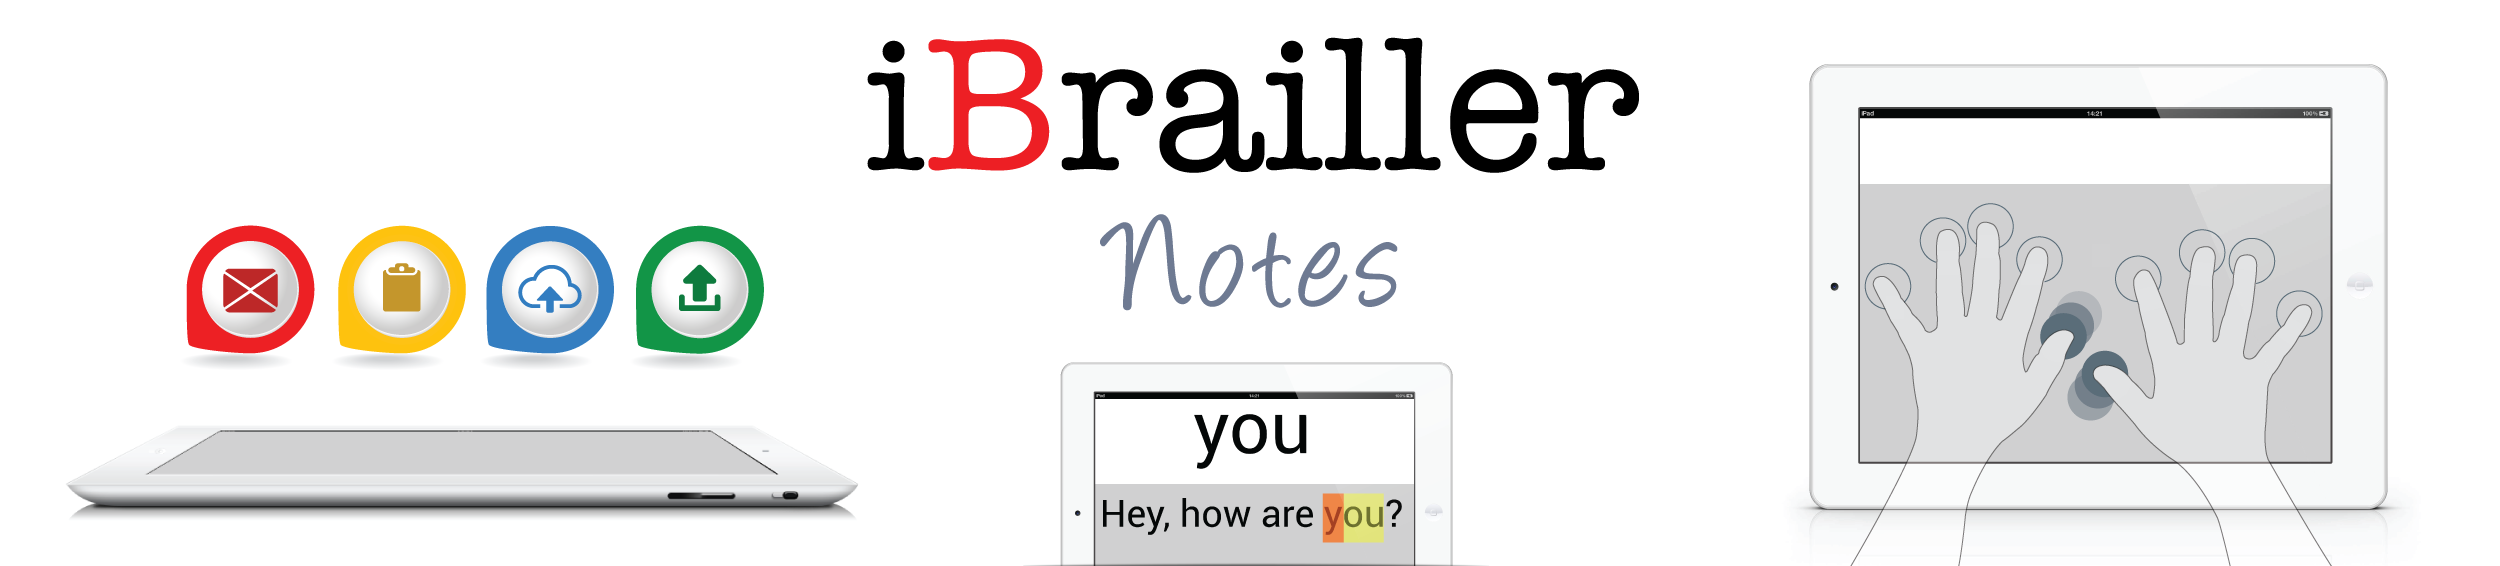 iBrailler_iOS_banner